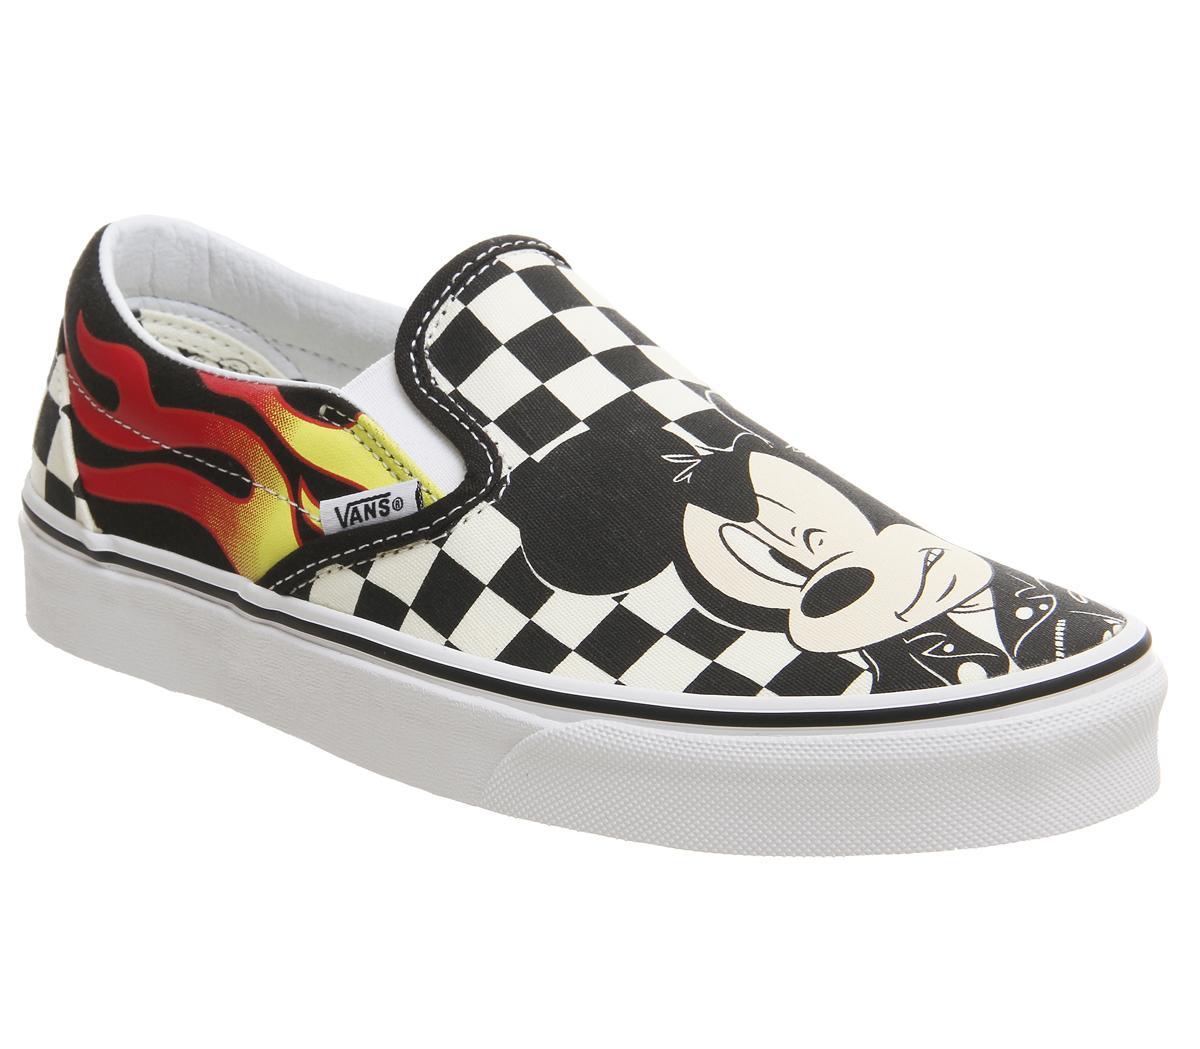 Gracia Creta ancla  Vans Vans Classic Slip On Trainers Mickey And Minnie Checker Flame Disney -  Hers trainers